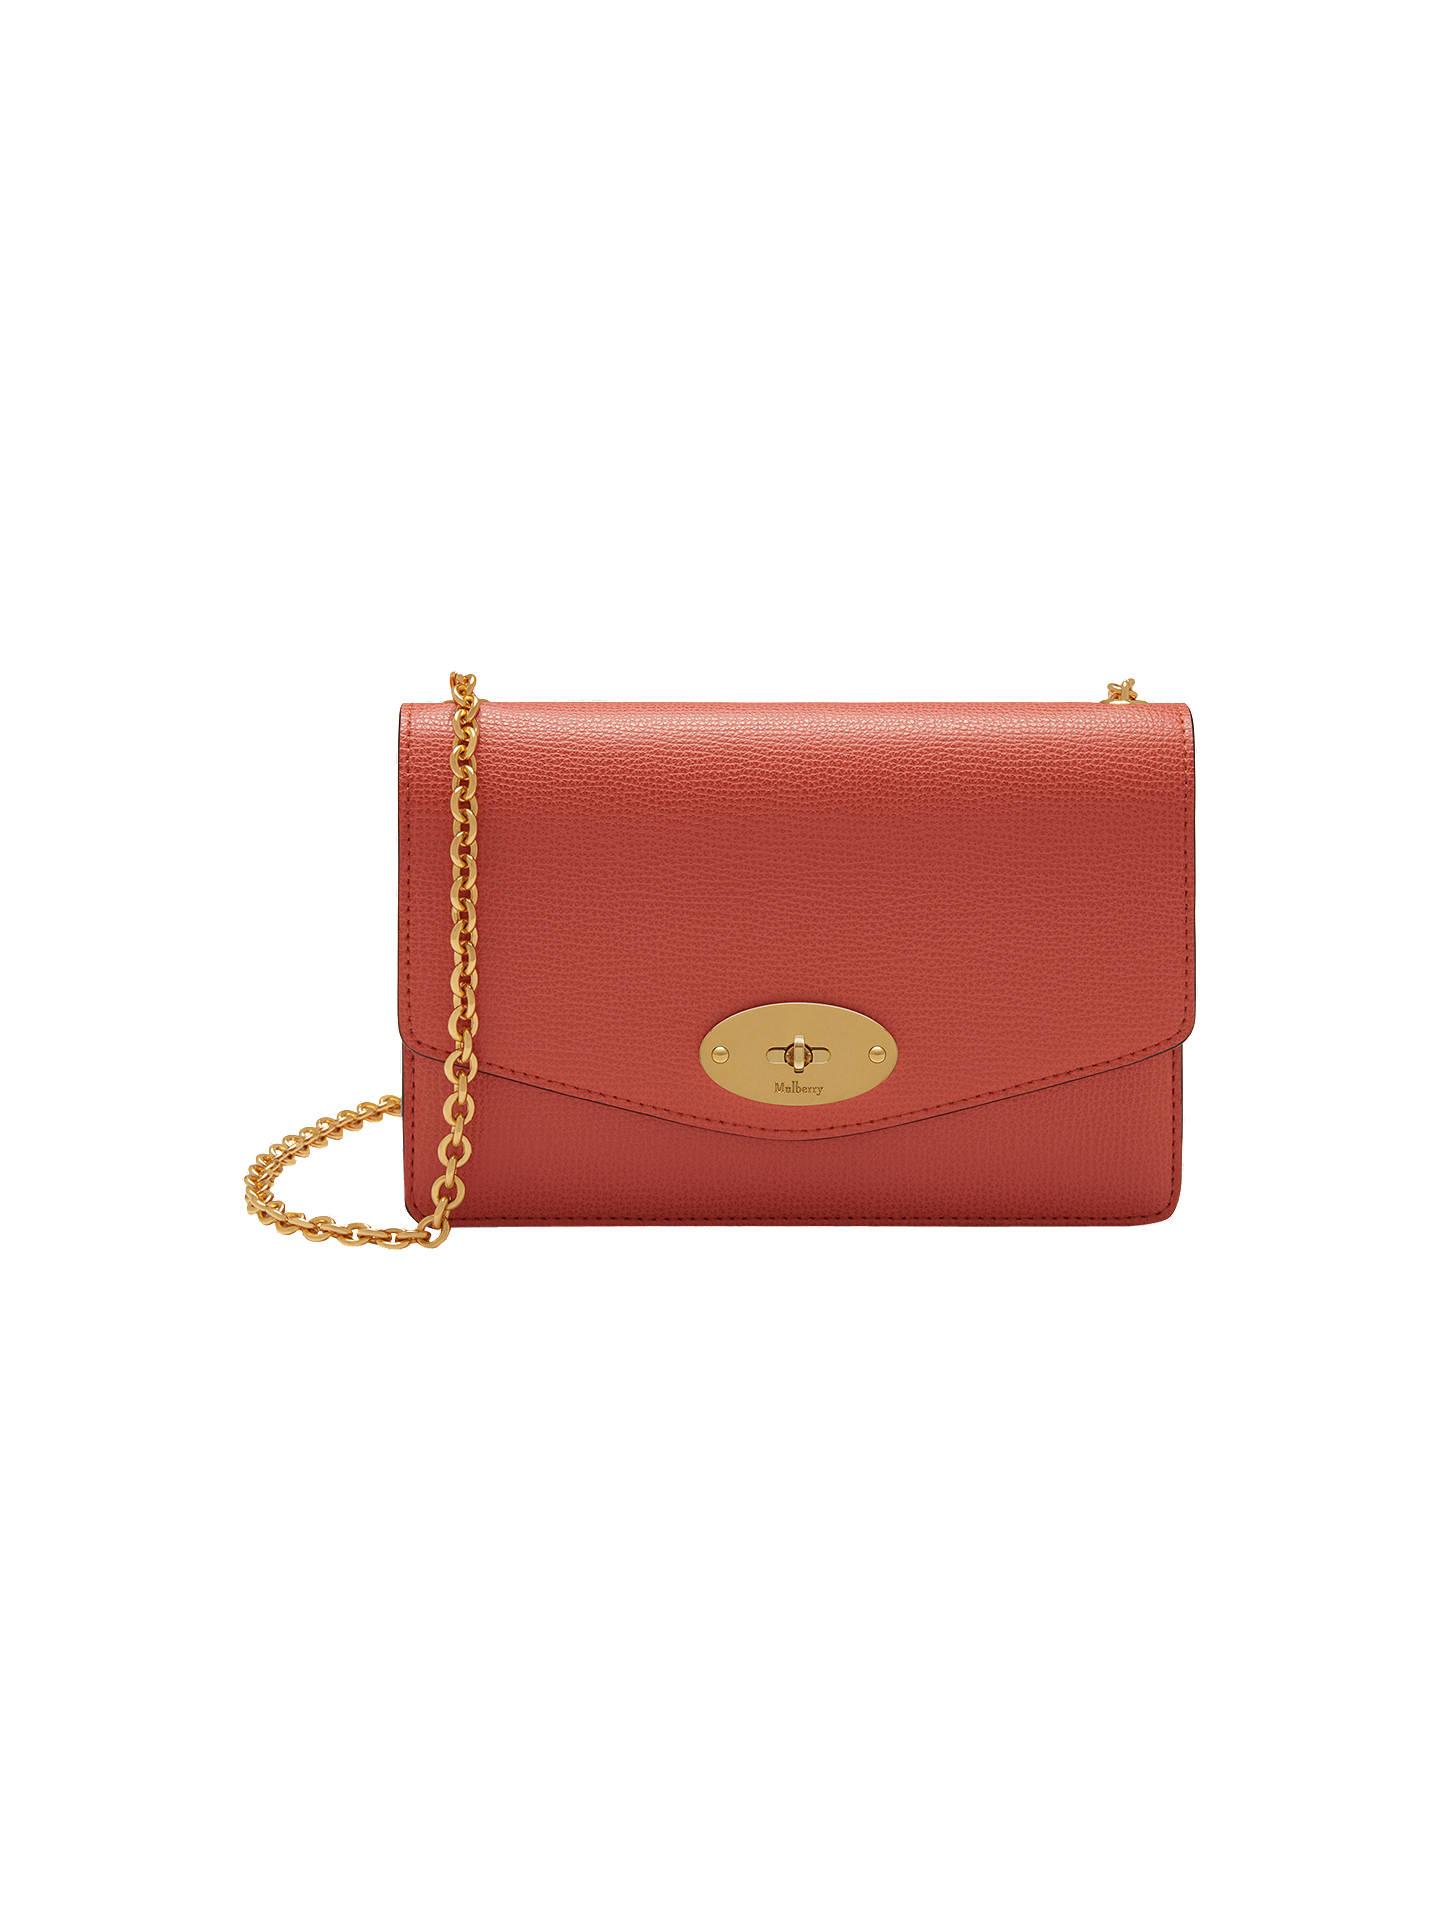 Mulberry Darley Small Grain Leather Cross Body Bag at John Lewis ... b5e053ac4ba4b